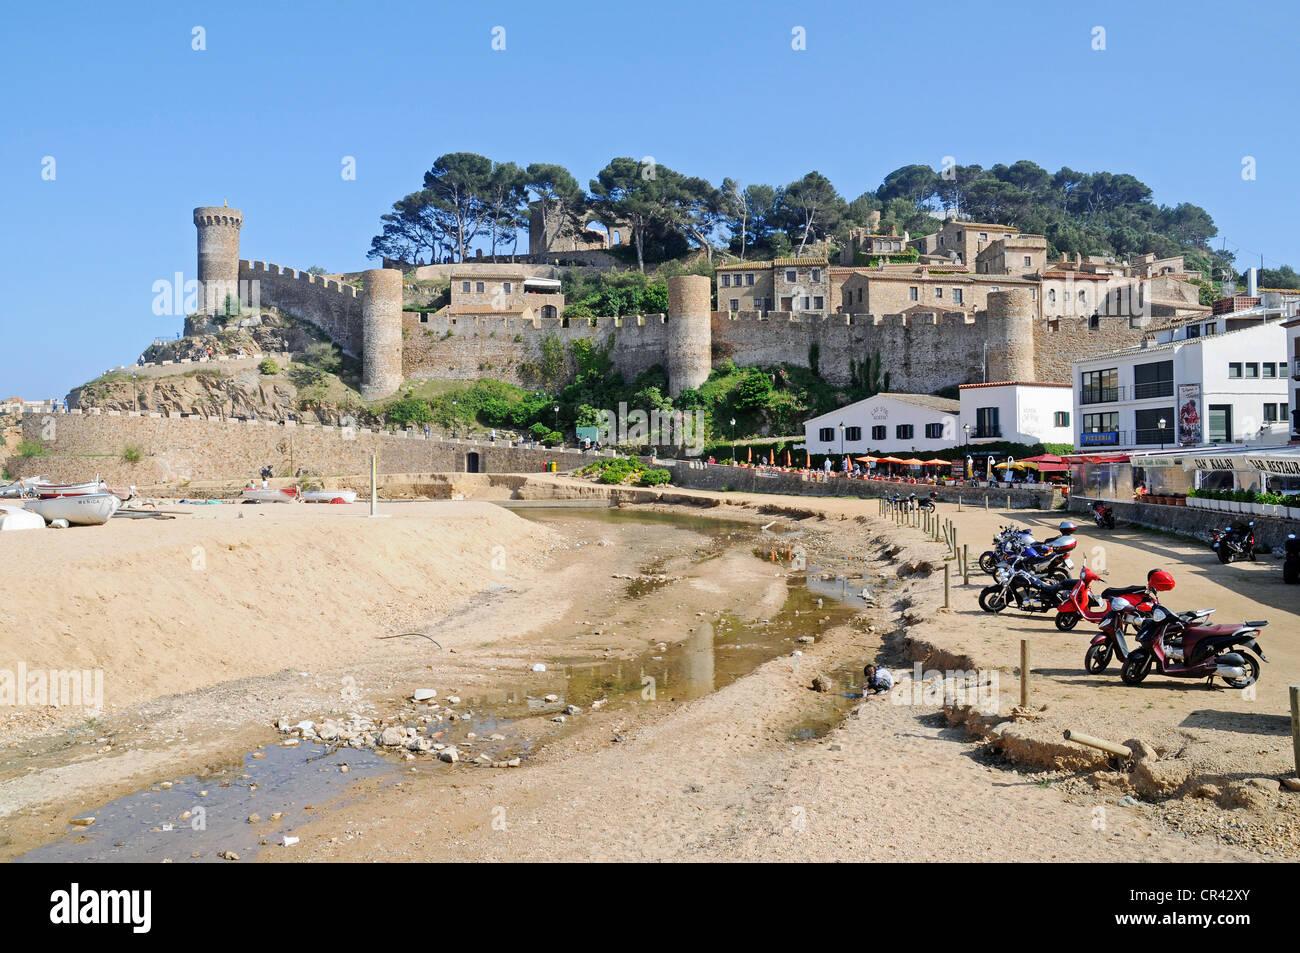 Castle Villa Vella, old town, coastal village Tossa de Mar, Costa Brava, Catalonia, Spain, Europe - Stock Image